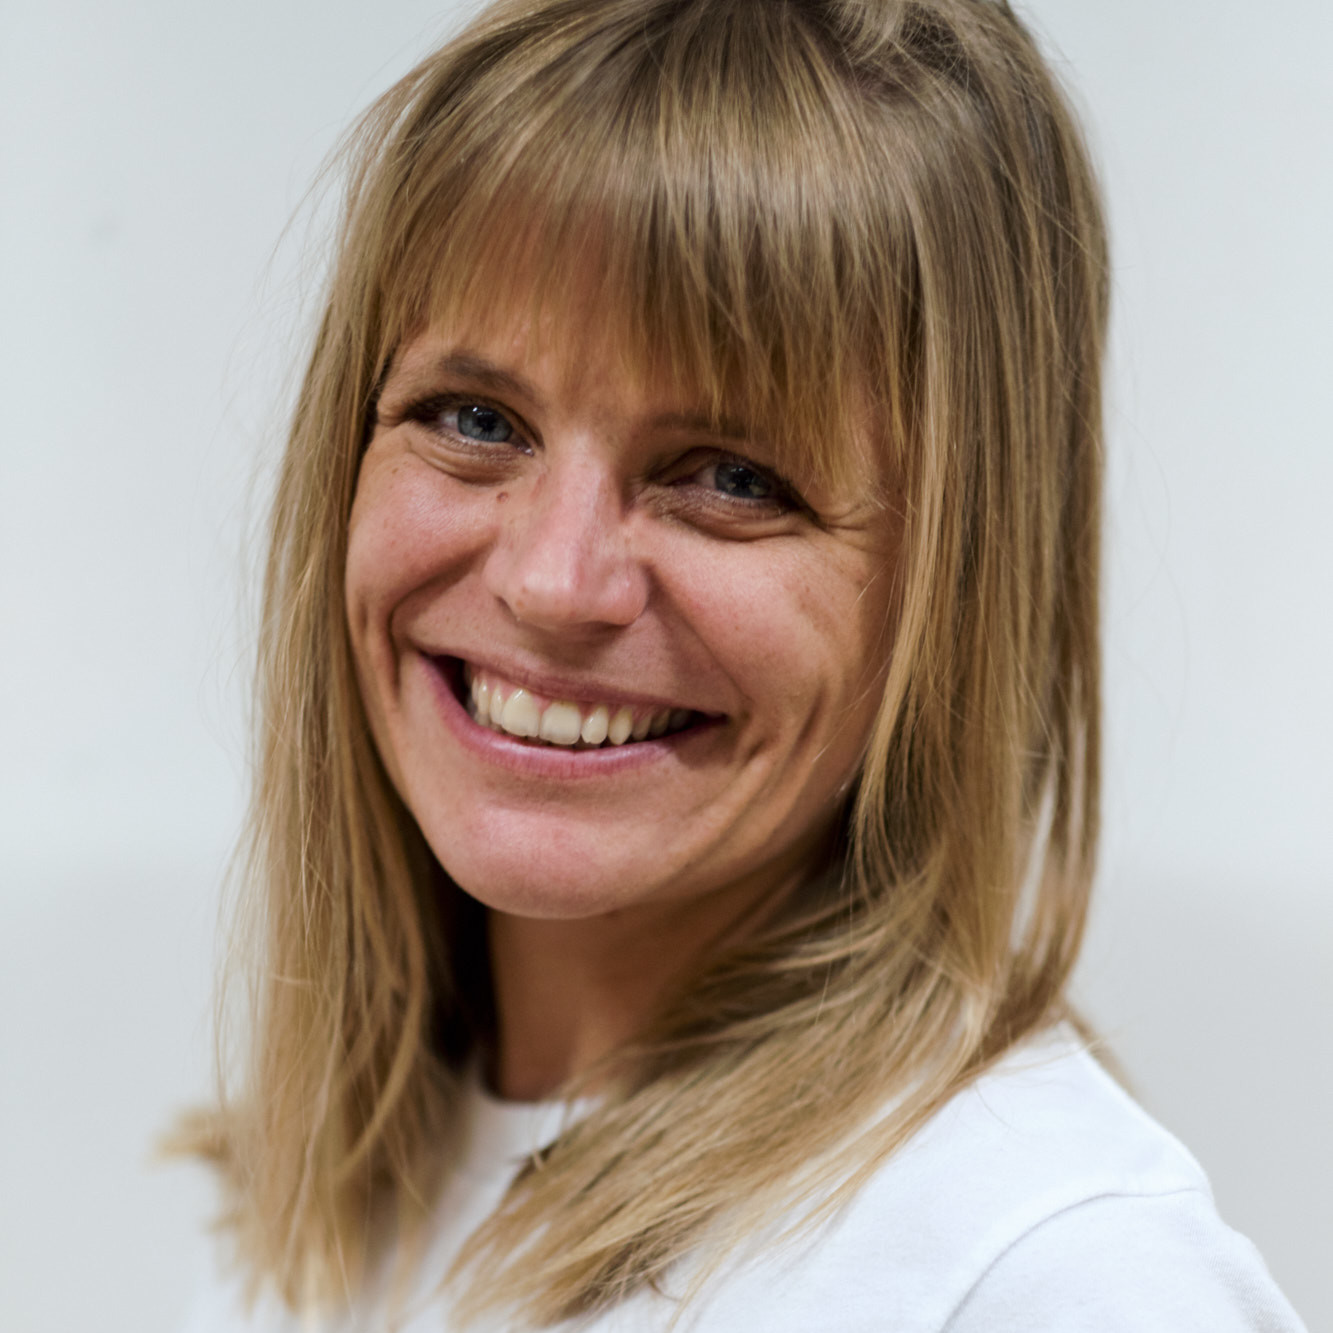 Julie Wolff Kerjouan